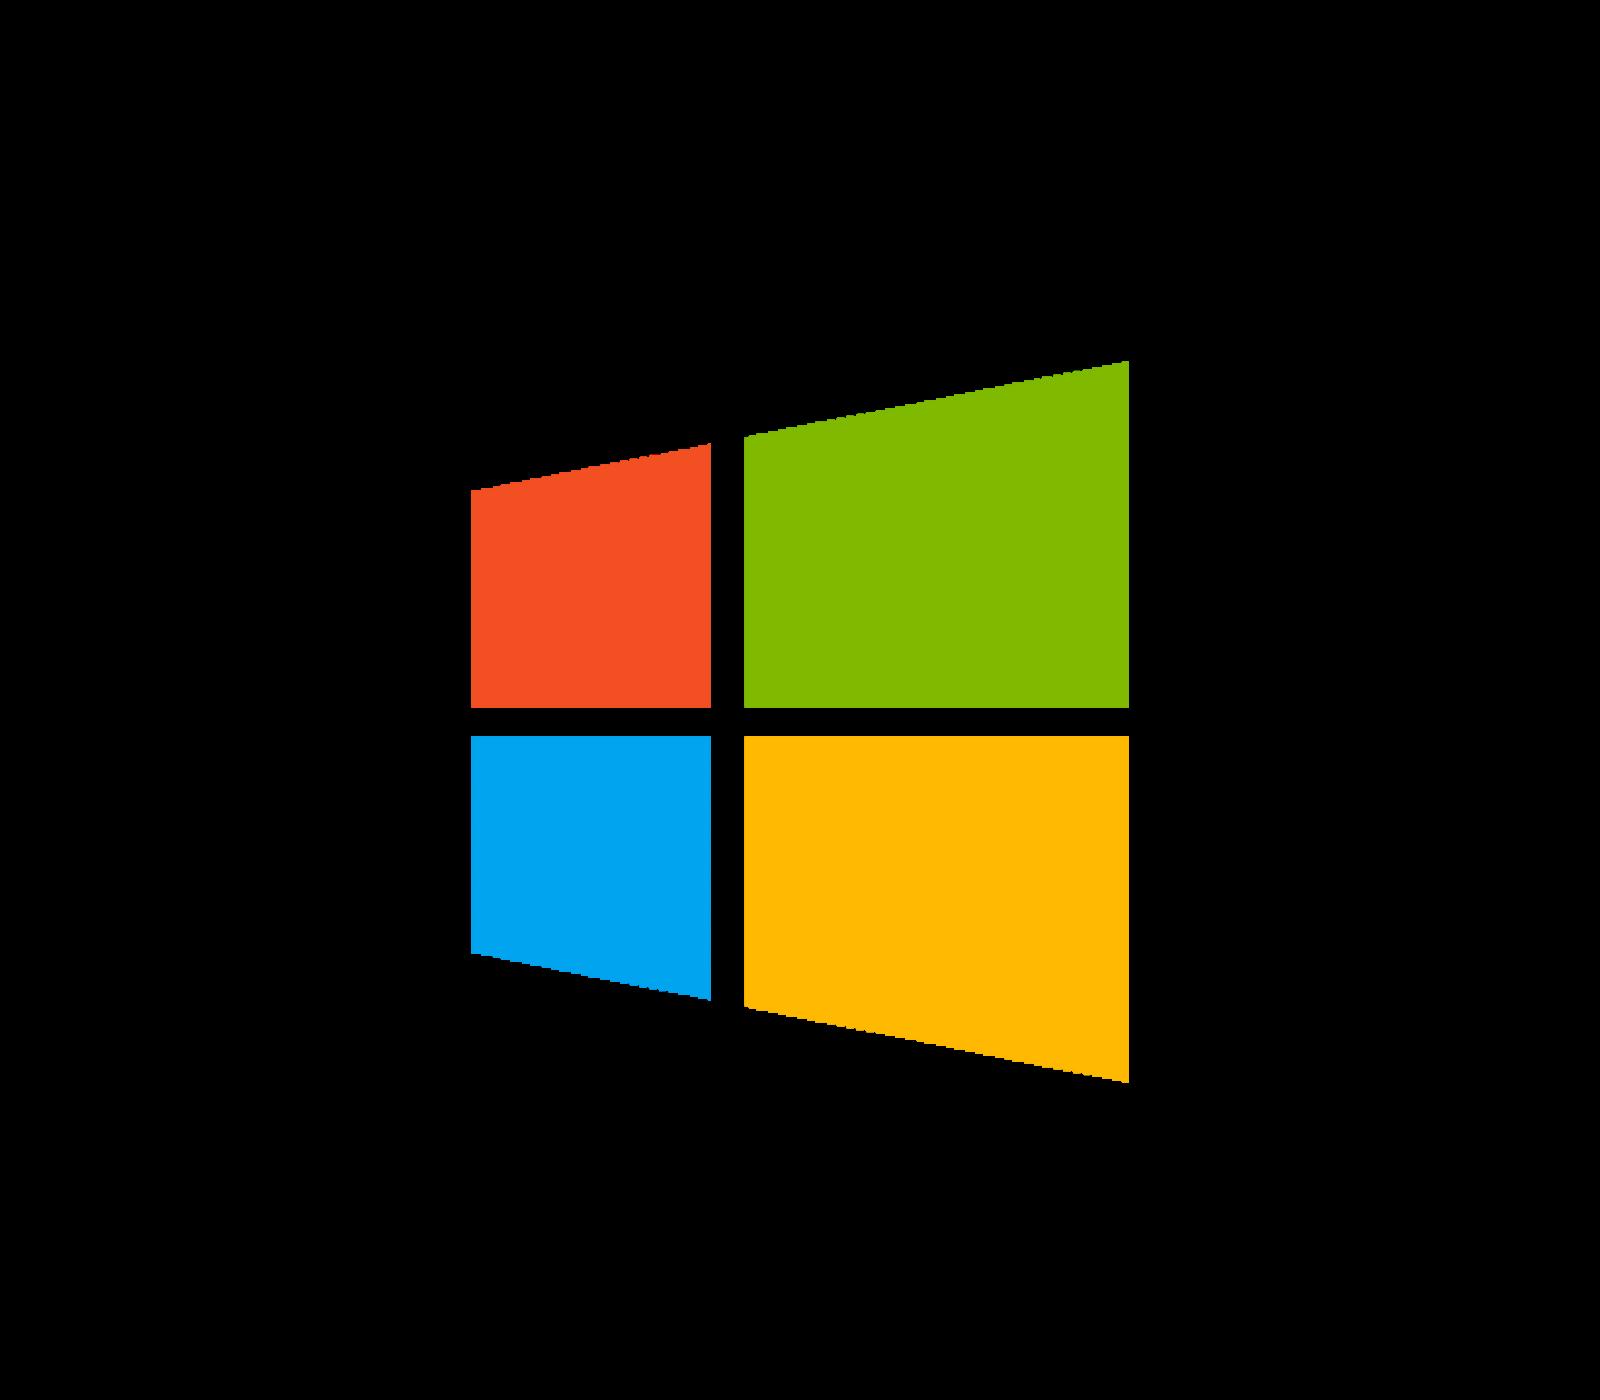 Download Windows PNG Free Download PNG File.